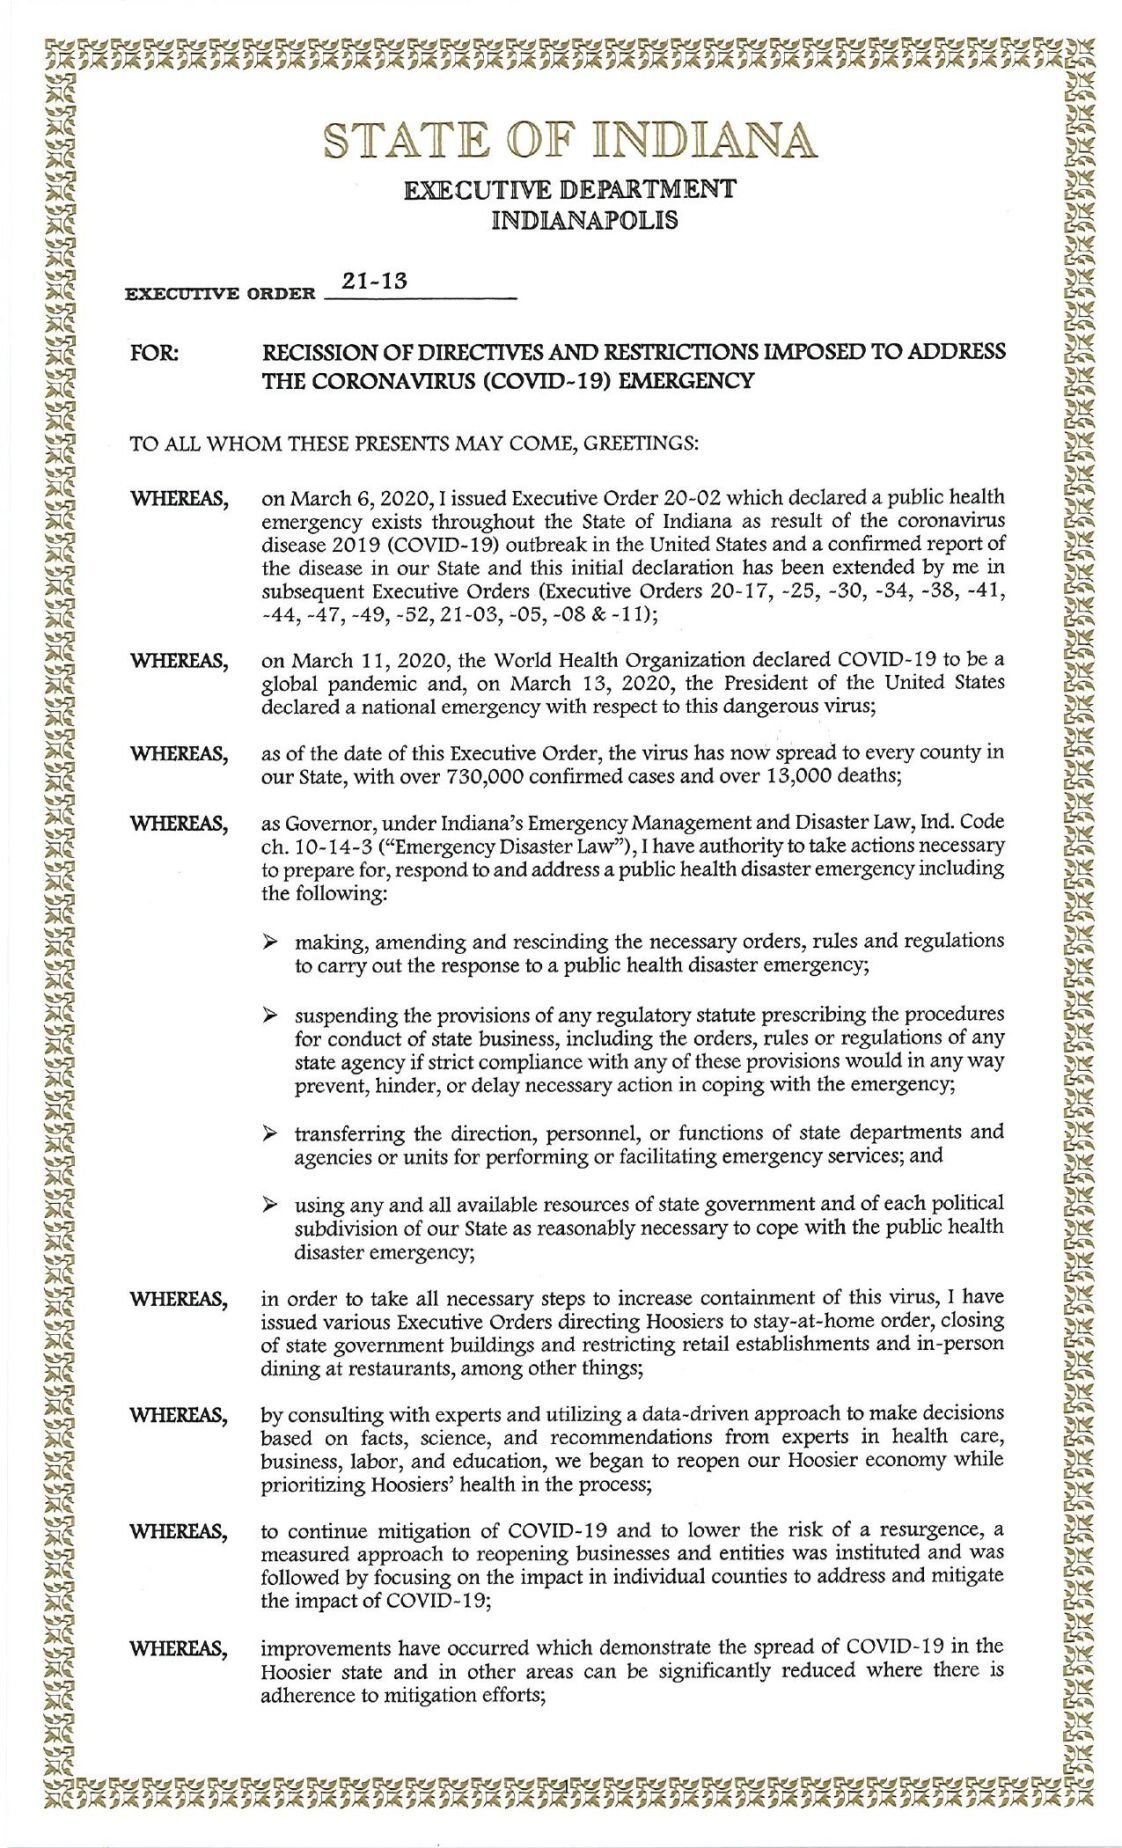 Gov. Eric Holcomb Executive Order 21-13